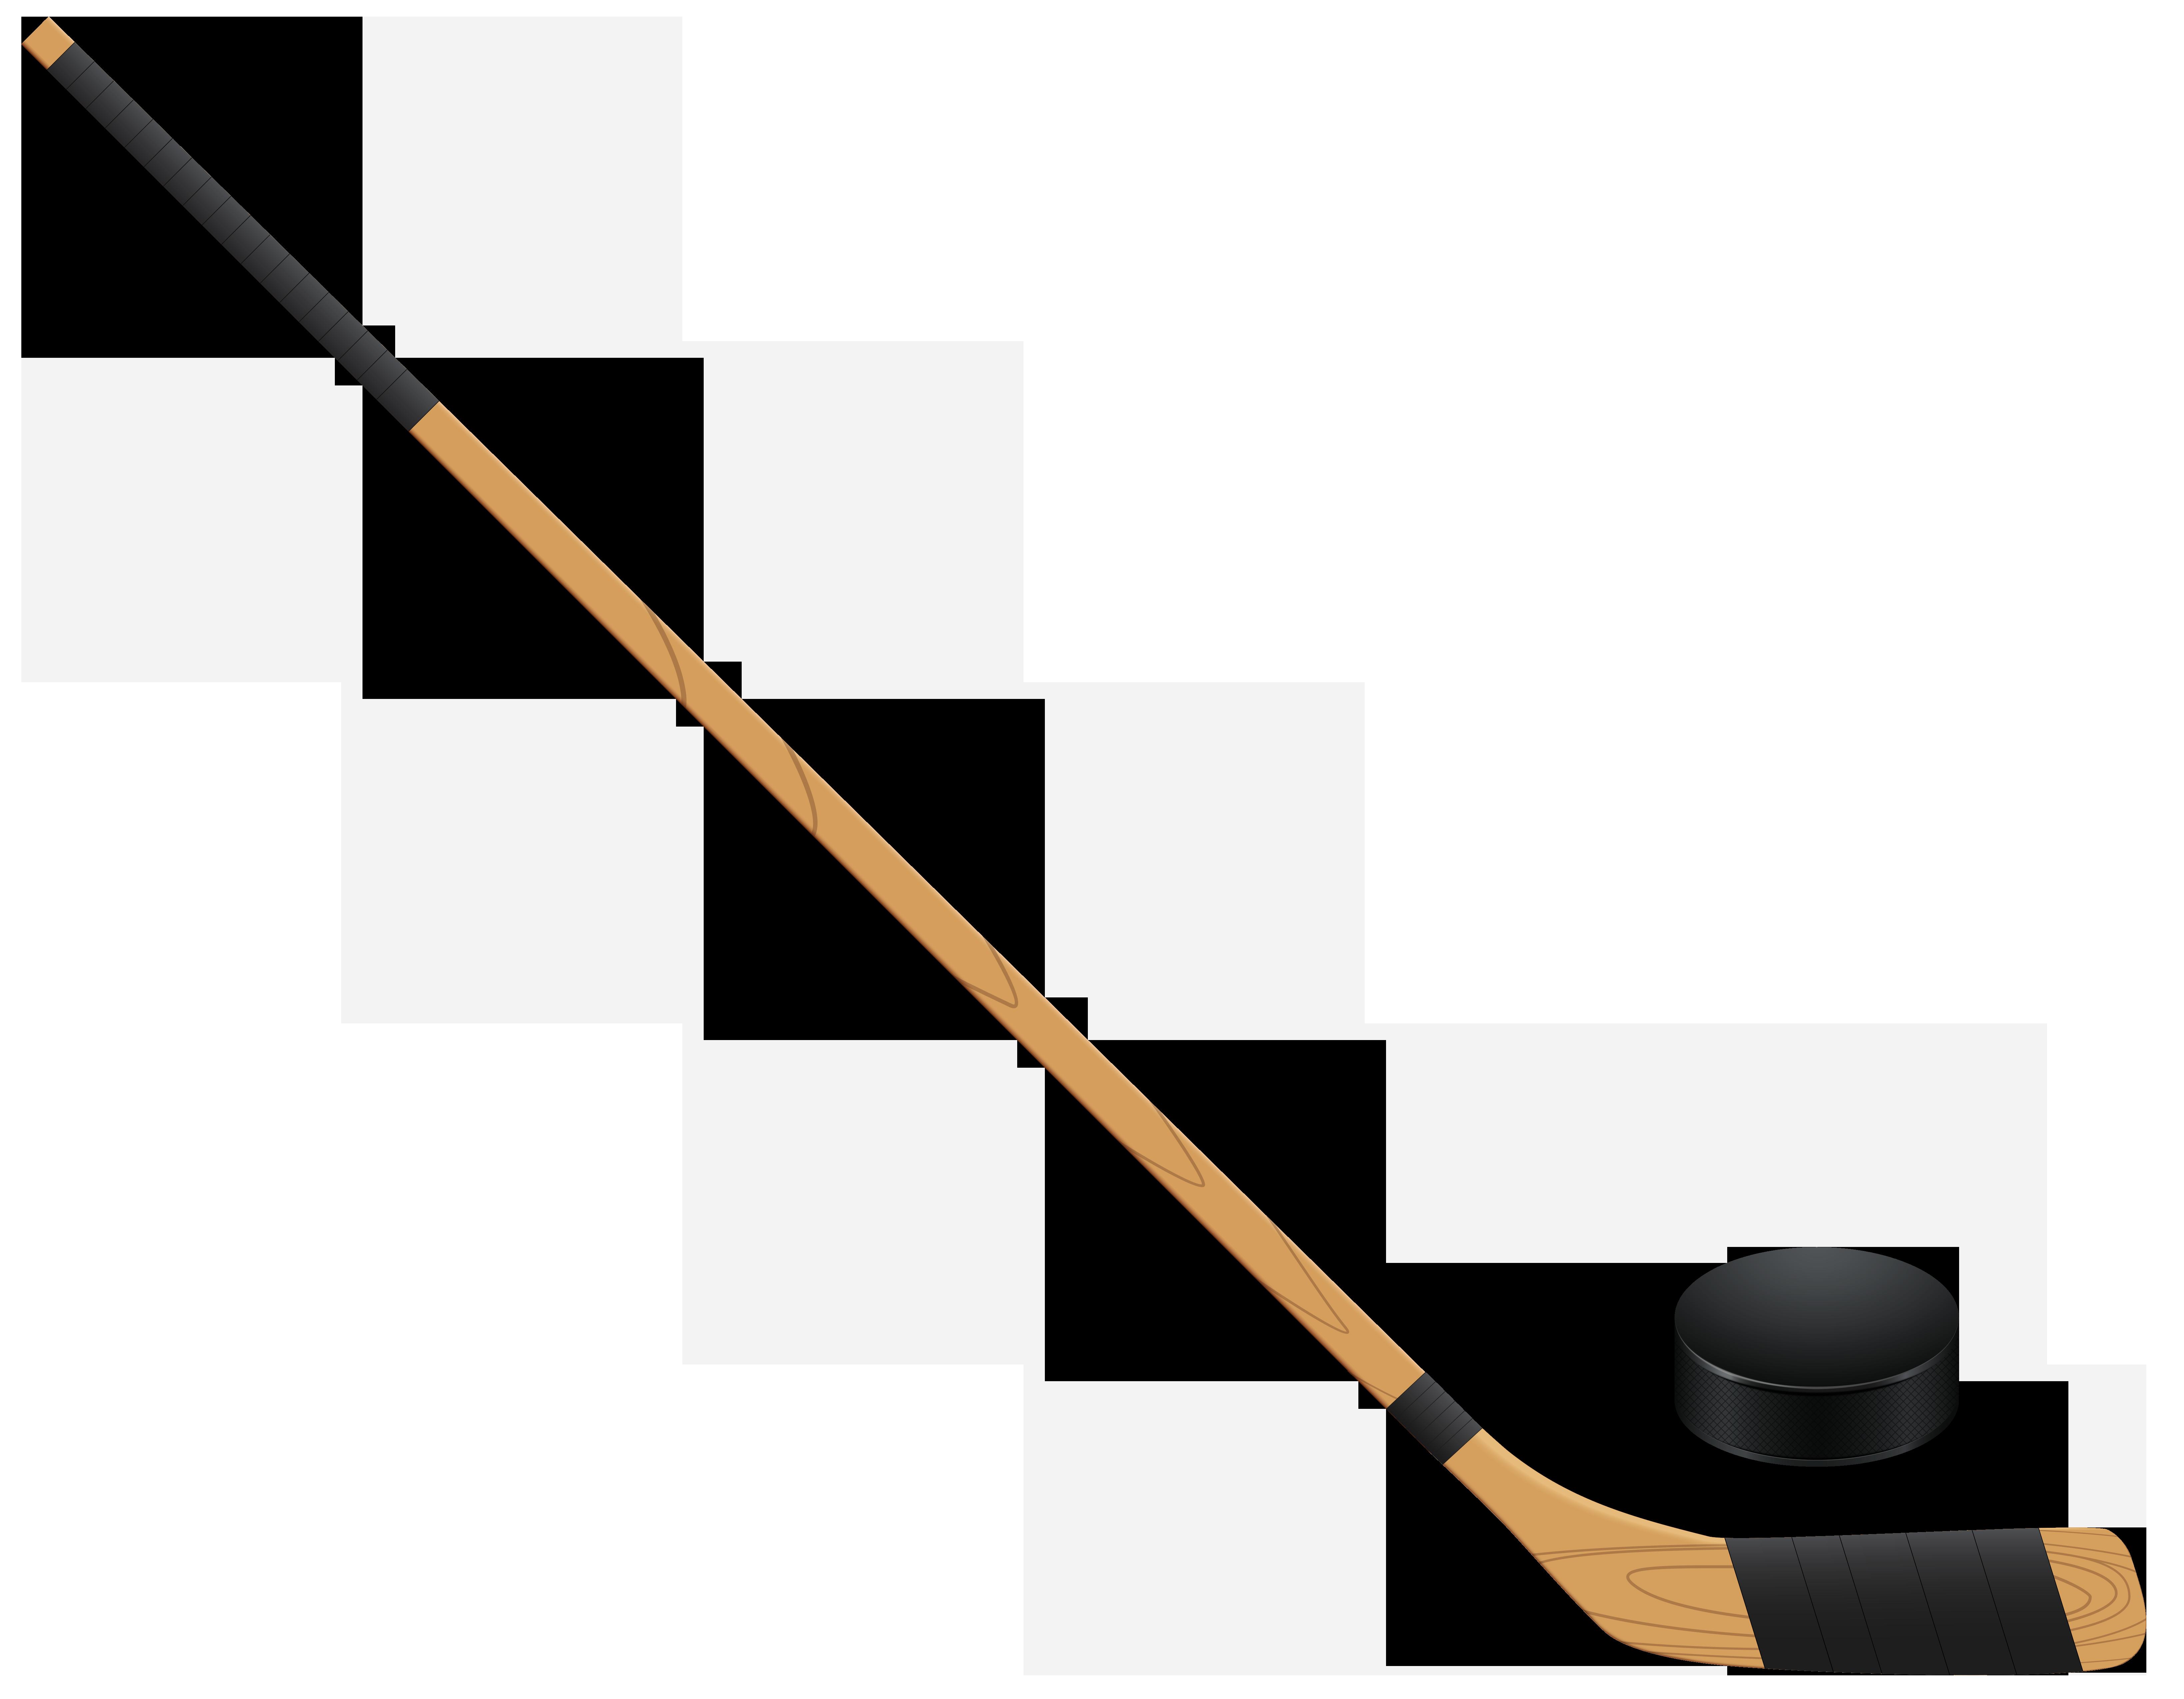 6555x5100 Hockey Stickand Puck Png Clip Art Imageu200b Gallery Yopriceville